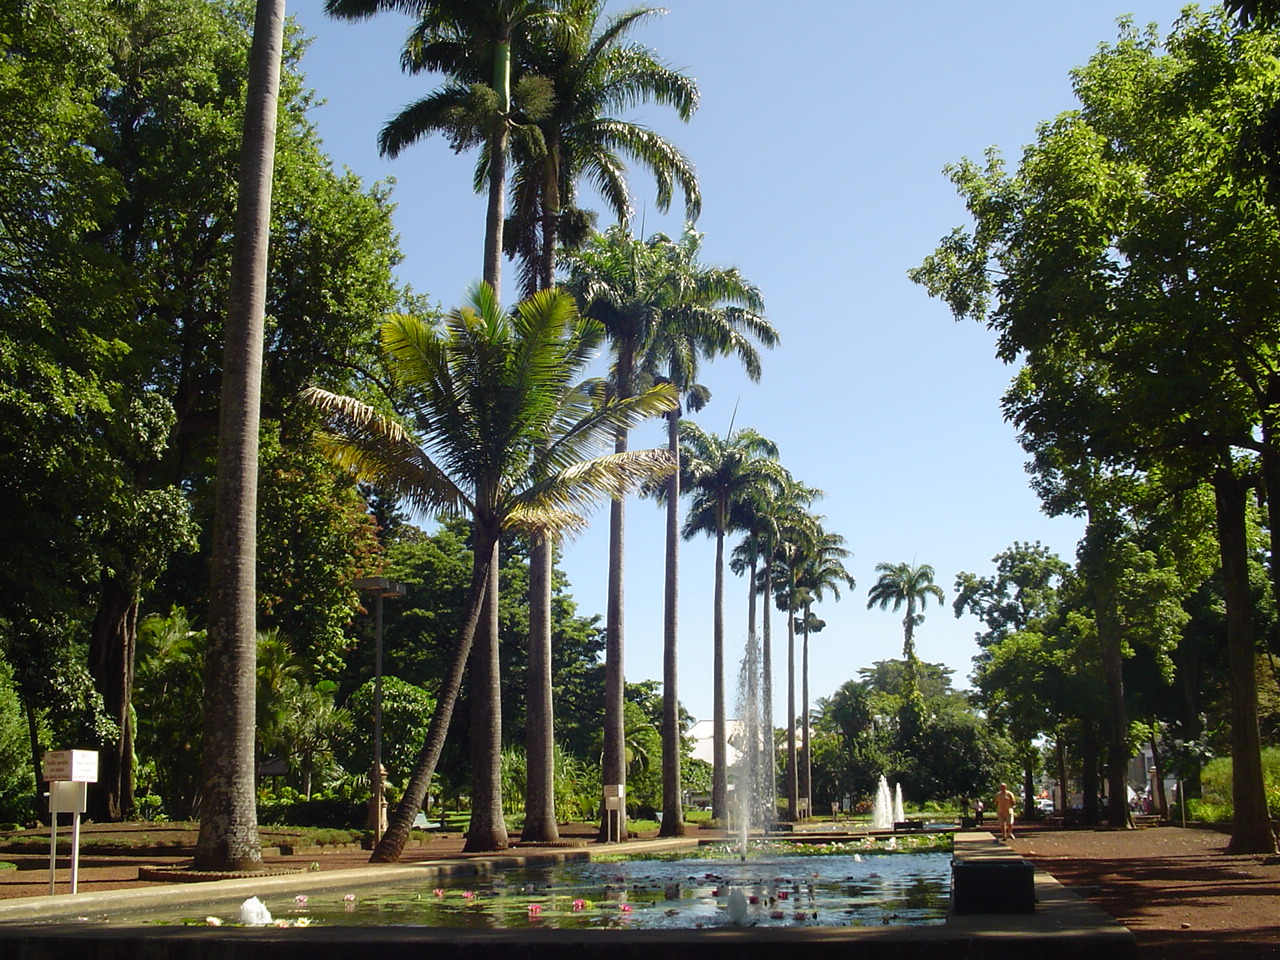 File jardin de letat saint denis 2855616910 jpg wikipedia - Table jardin hexagonale saint denis ...